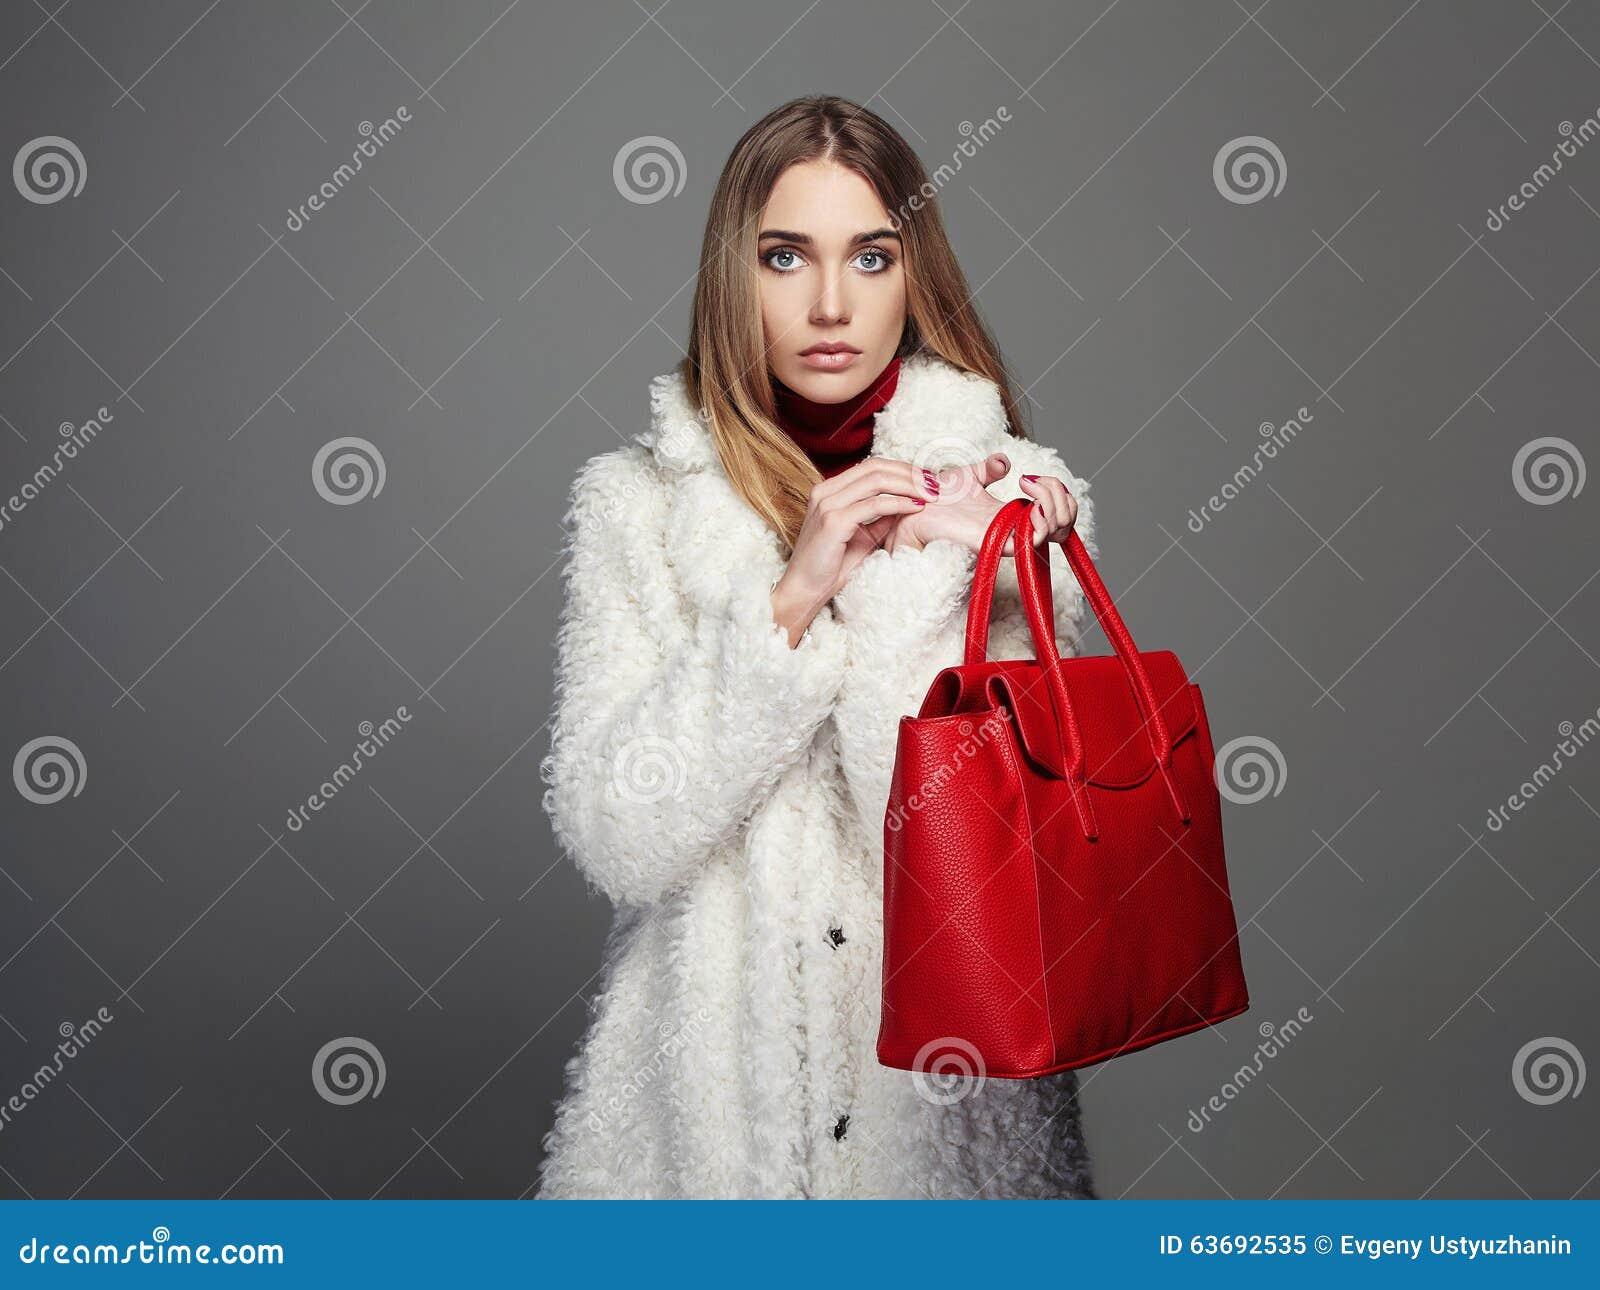 Winter beautiful Woman with red Handbag. Beauty Fashion Model Girl in fur